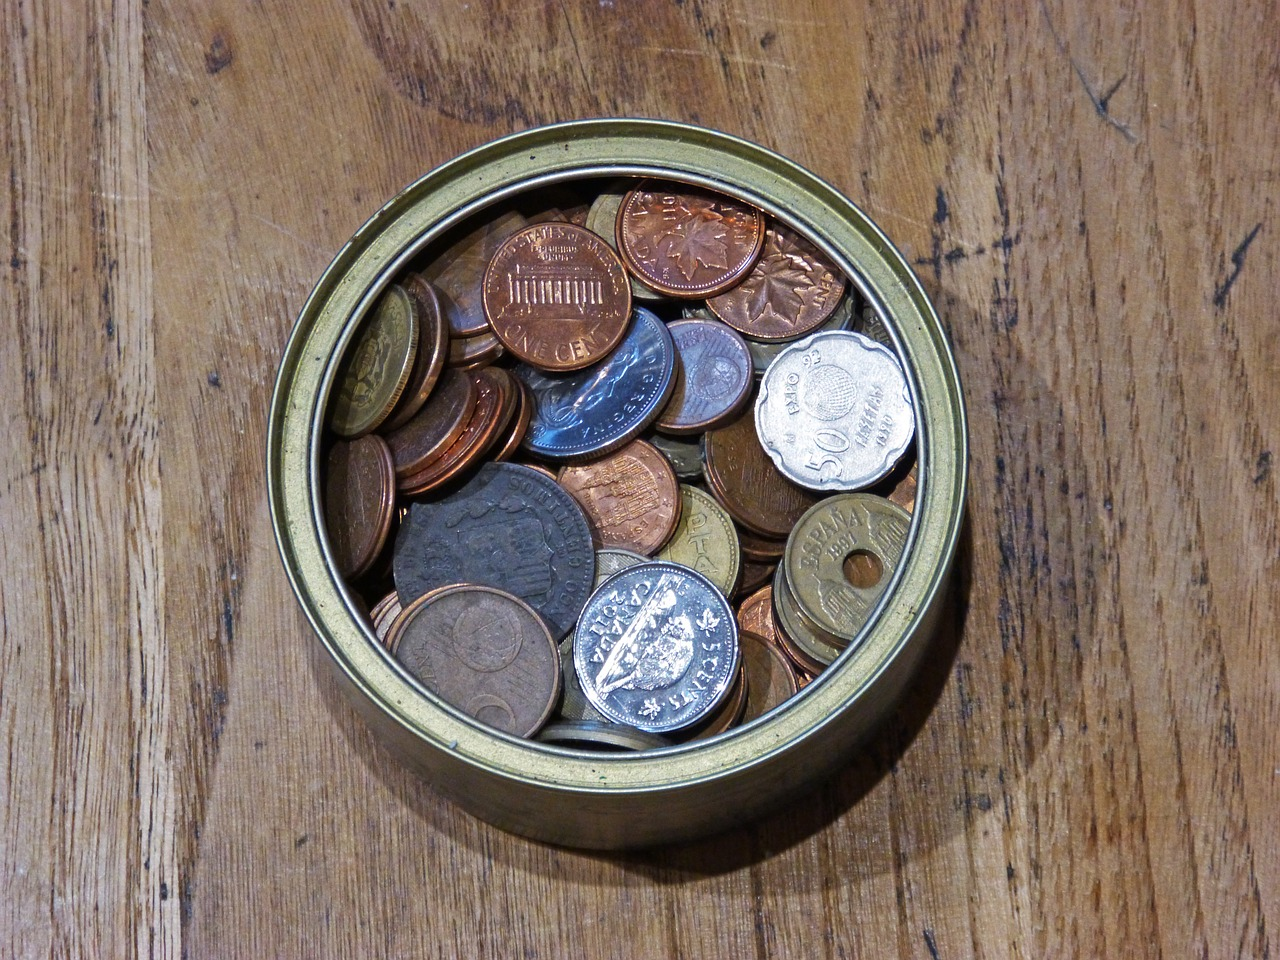 Нумизматика: как зарабатывать на монетах